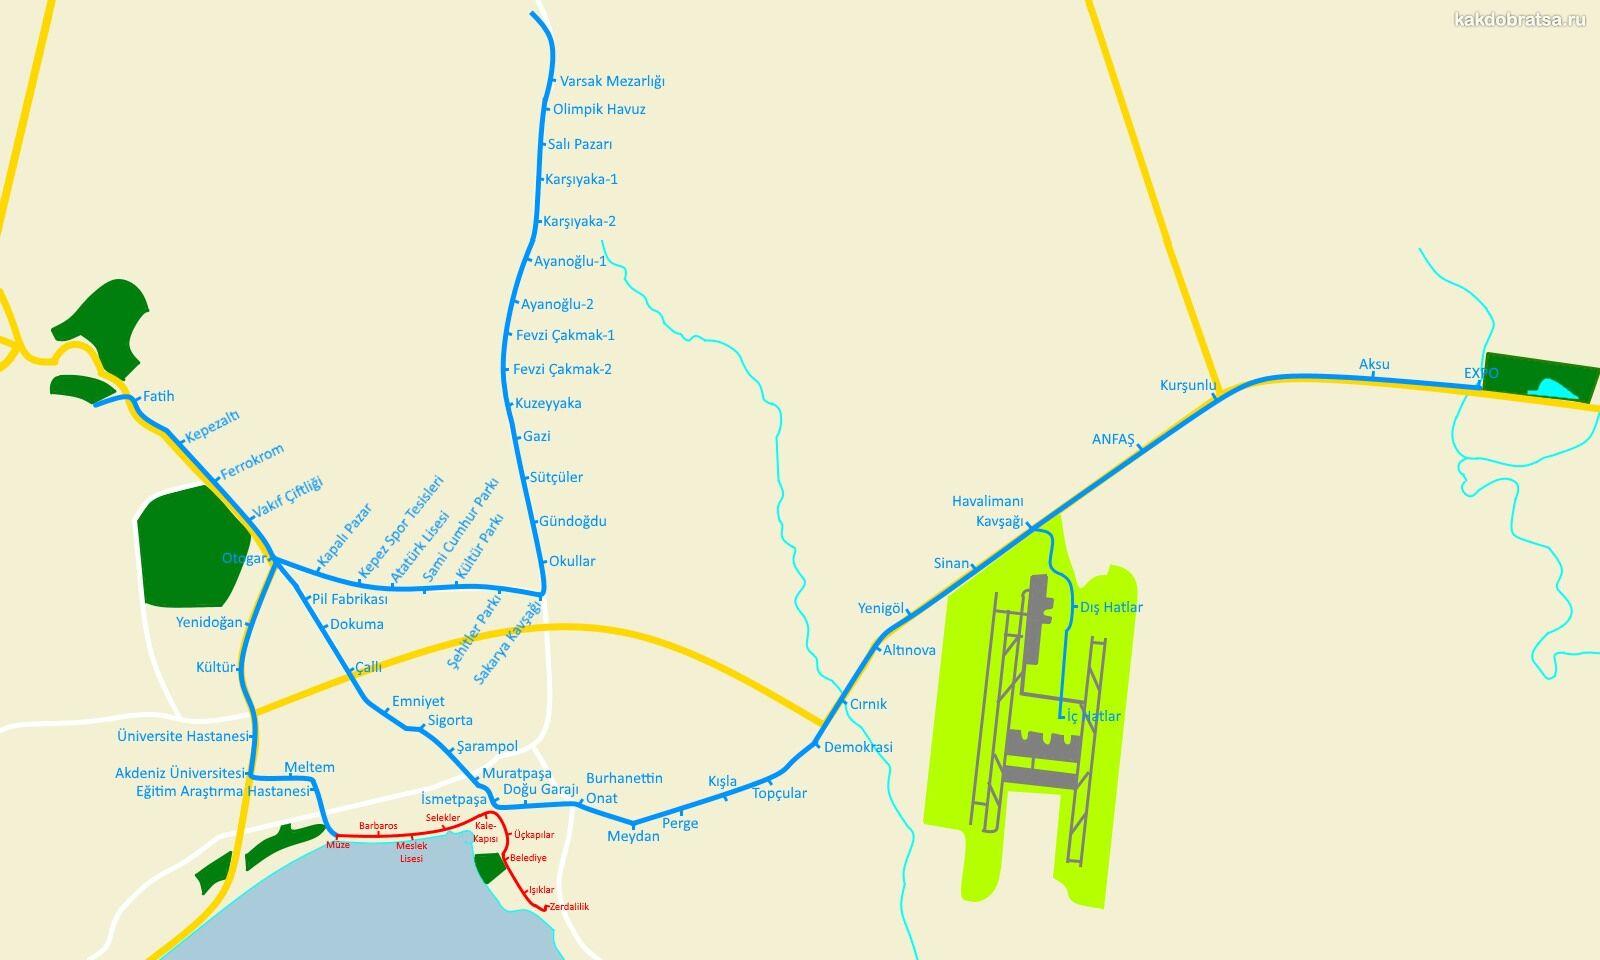 Карта схема трамваев Анталии